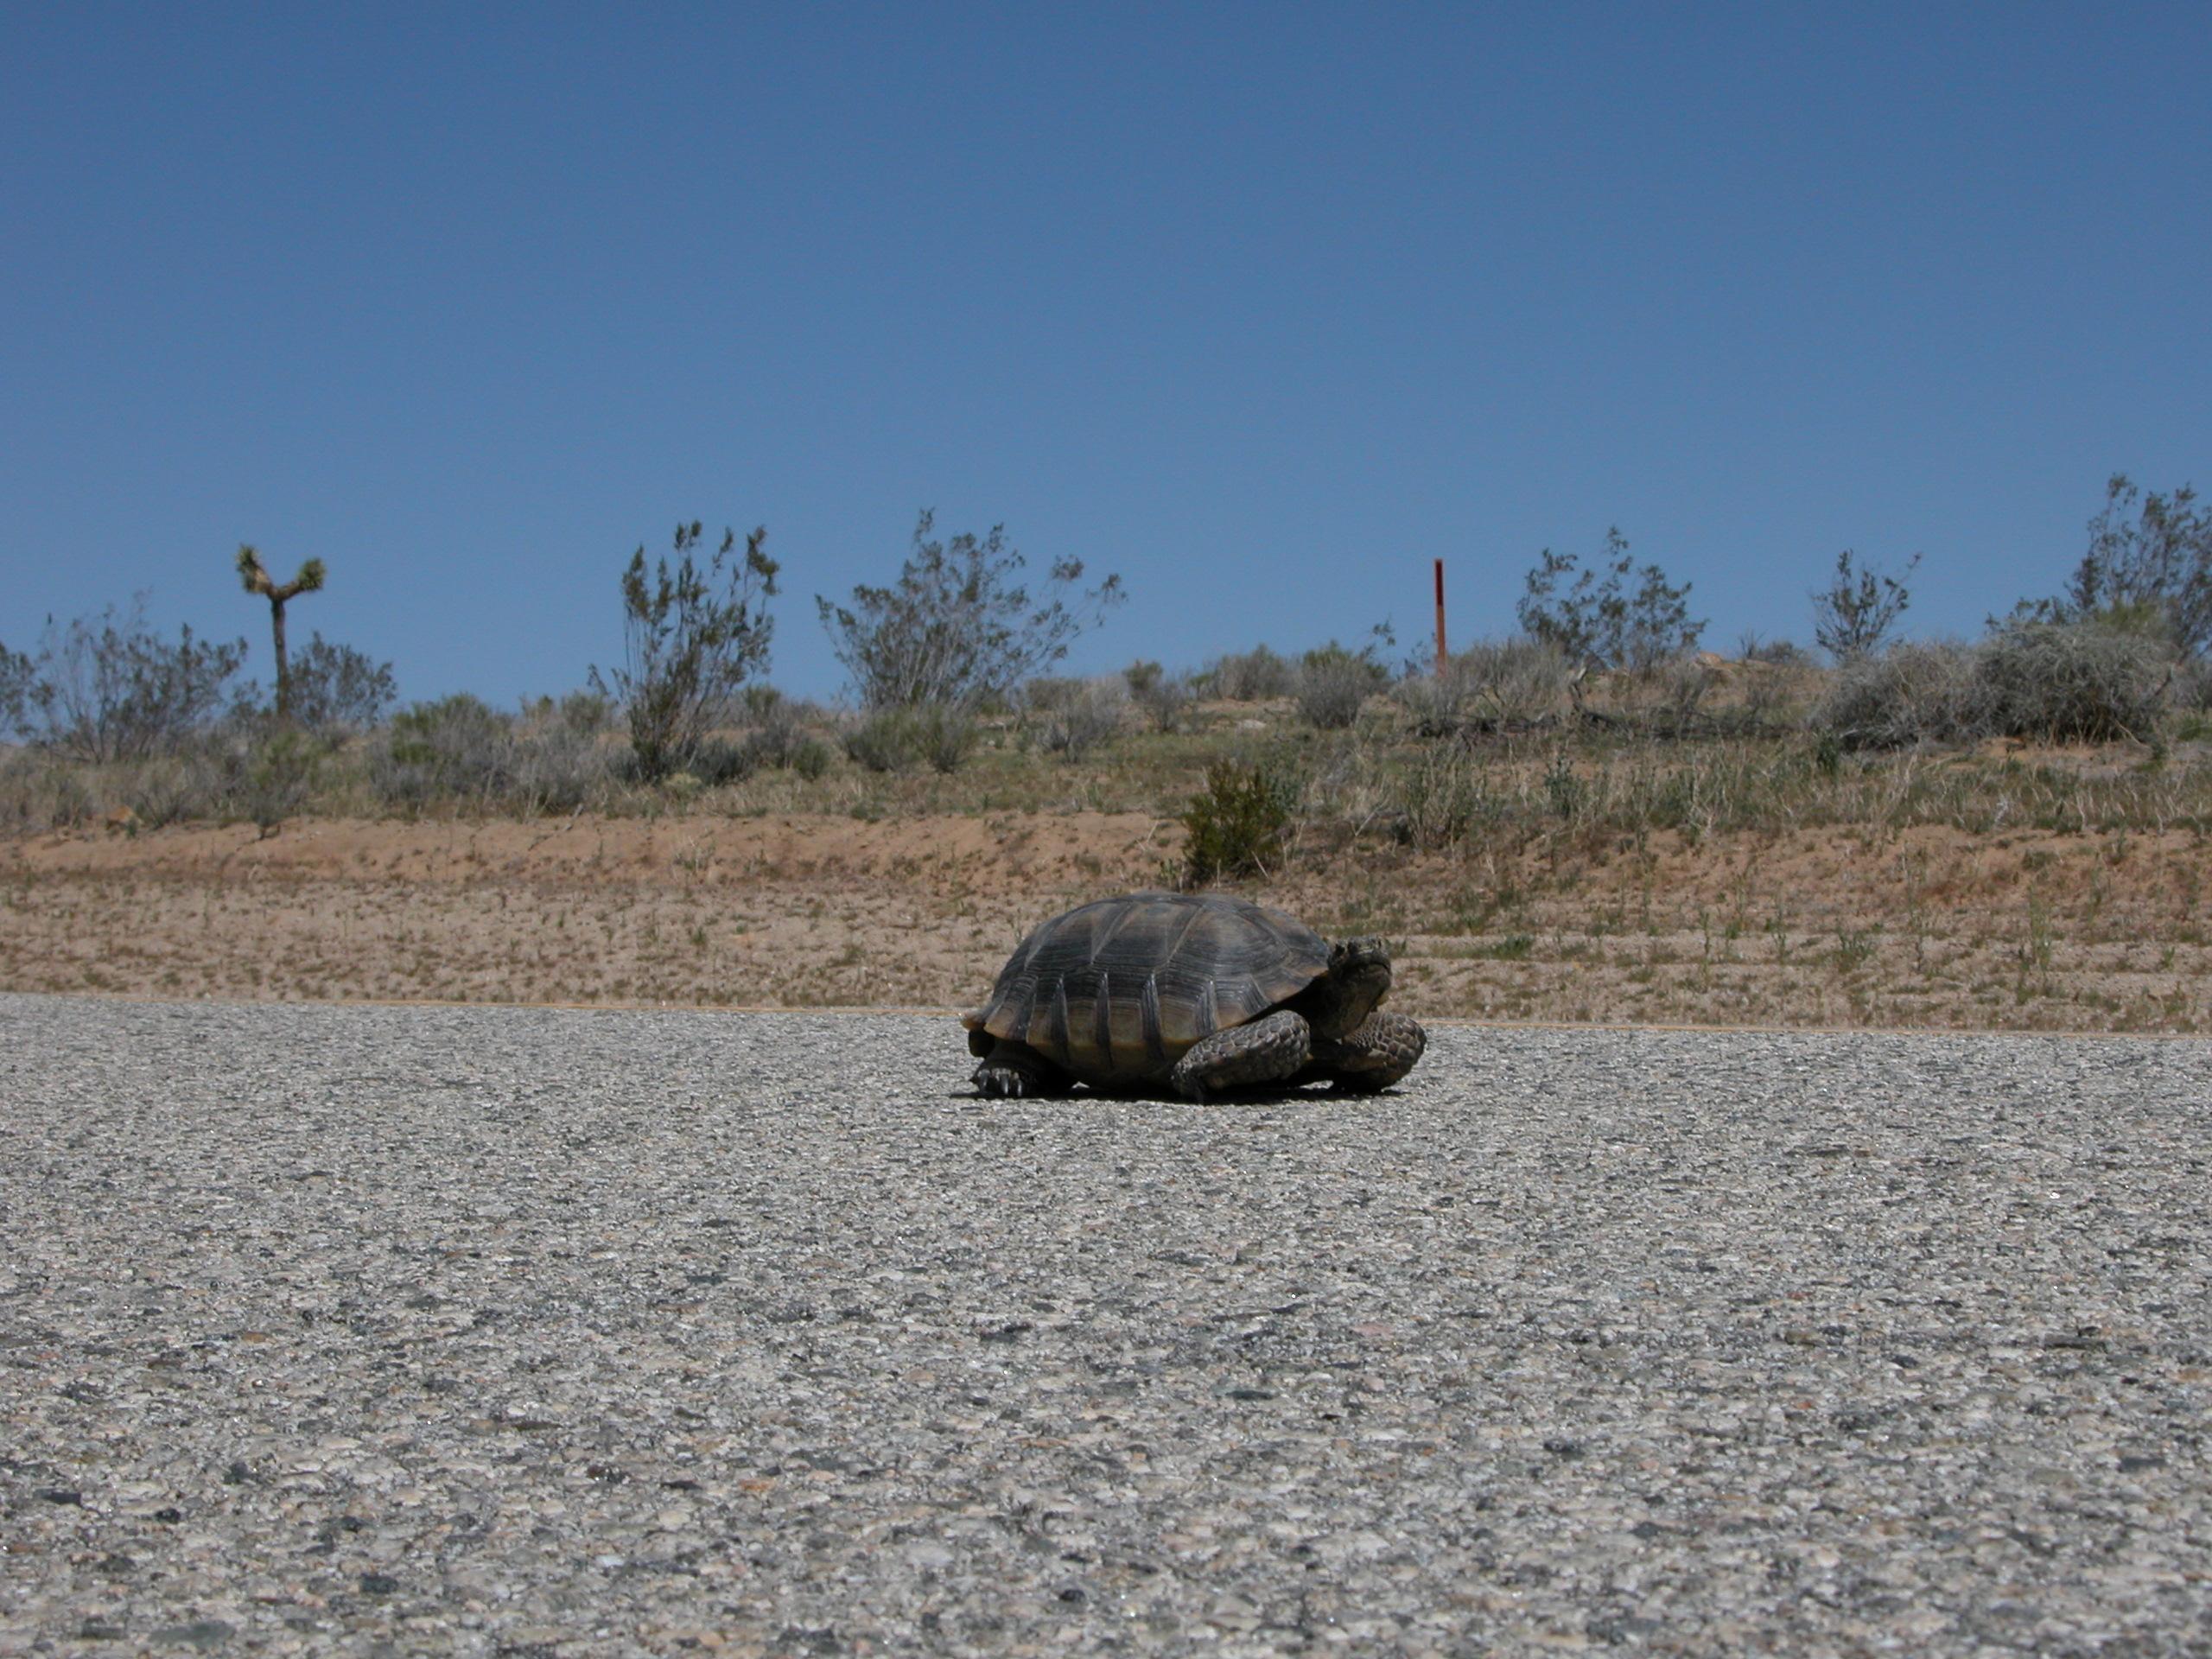 New guidance - stop and help desert tortoises cross road if